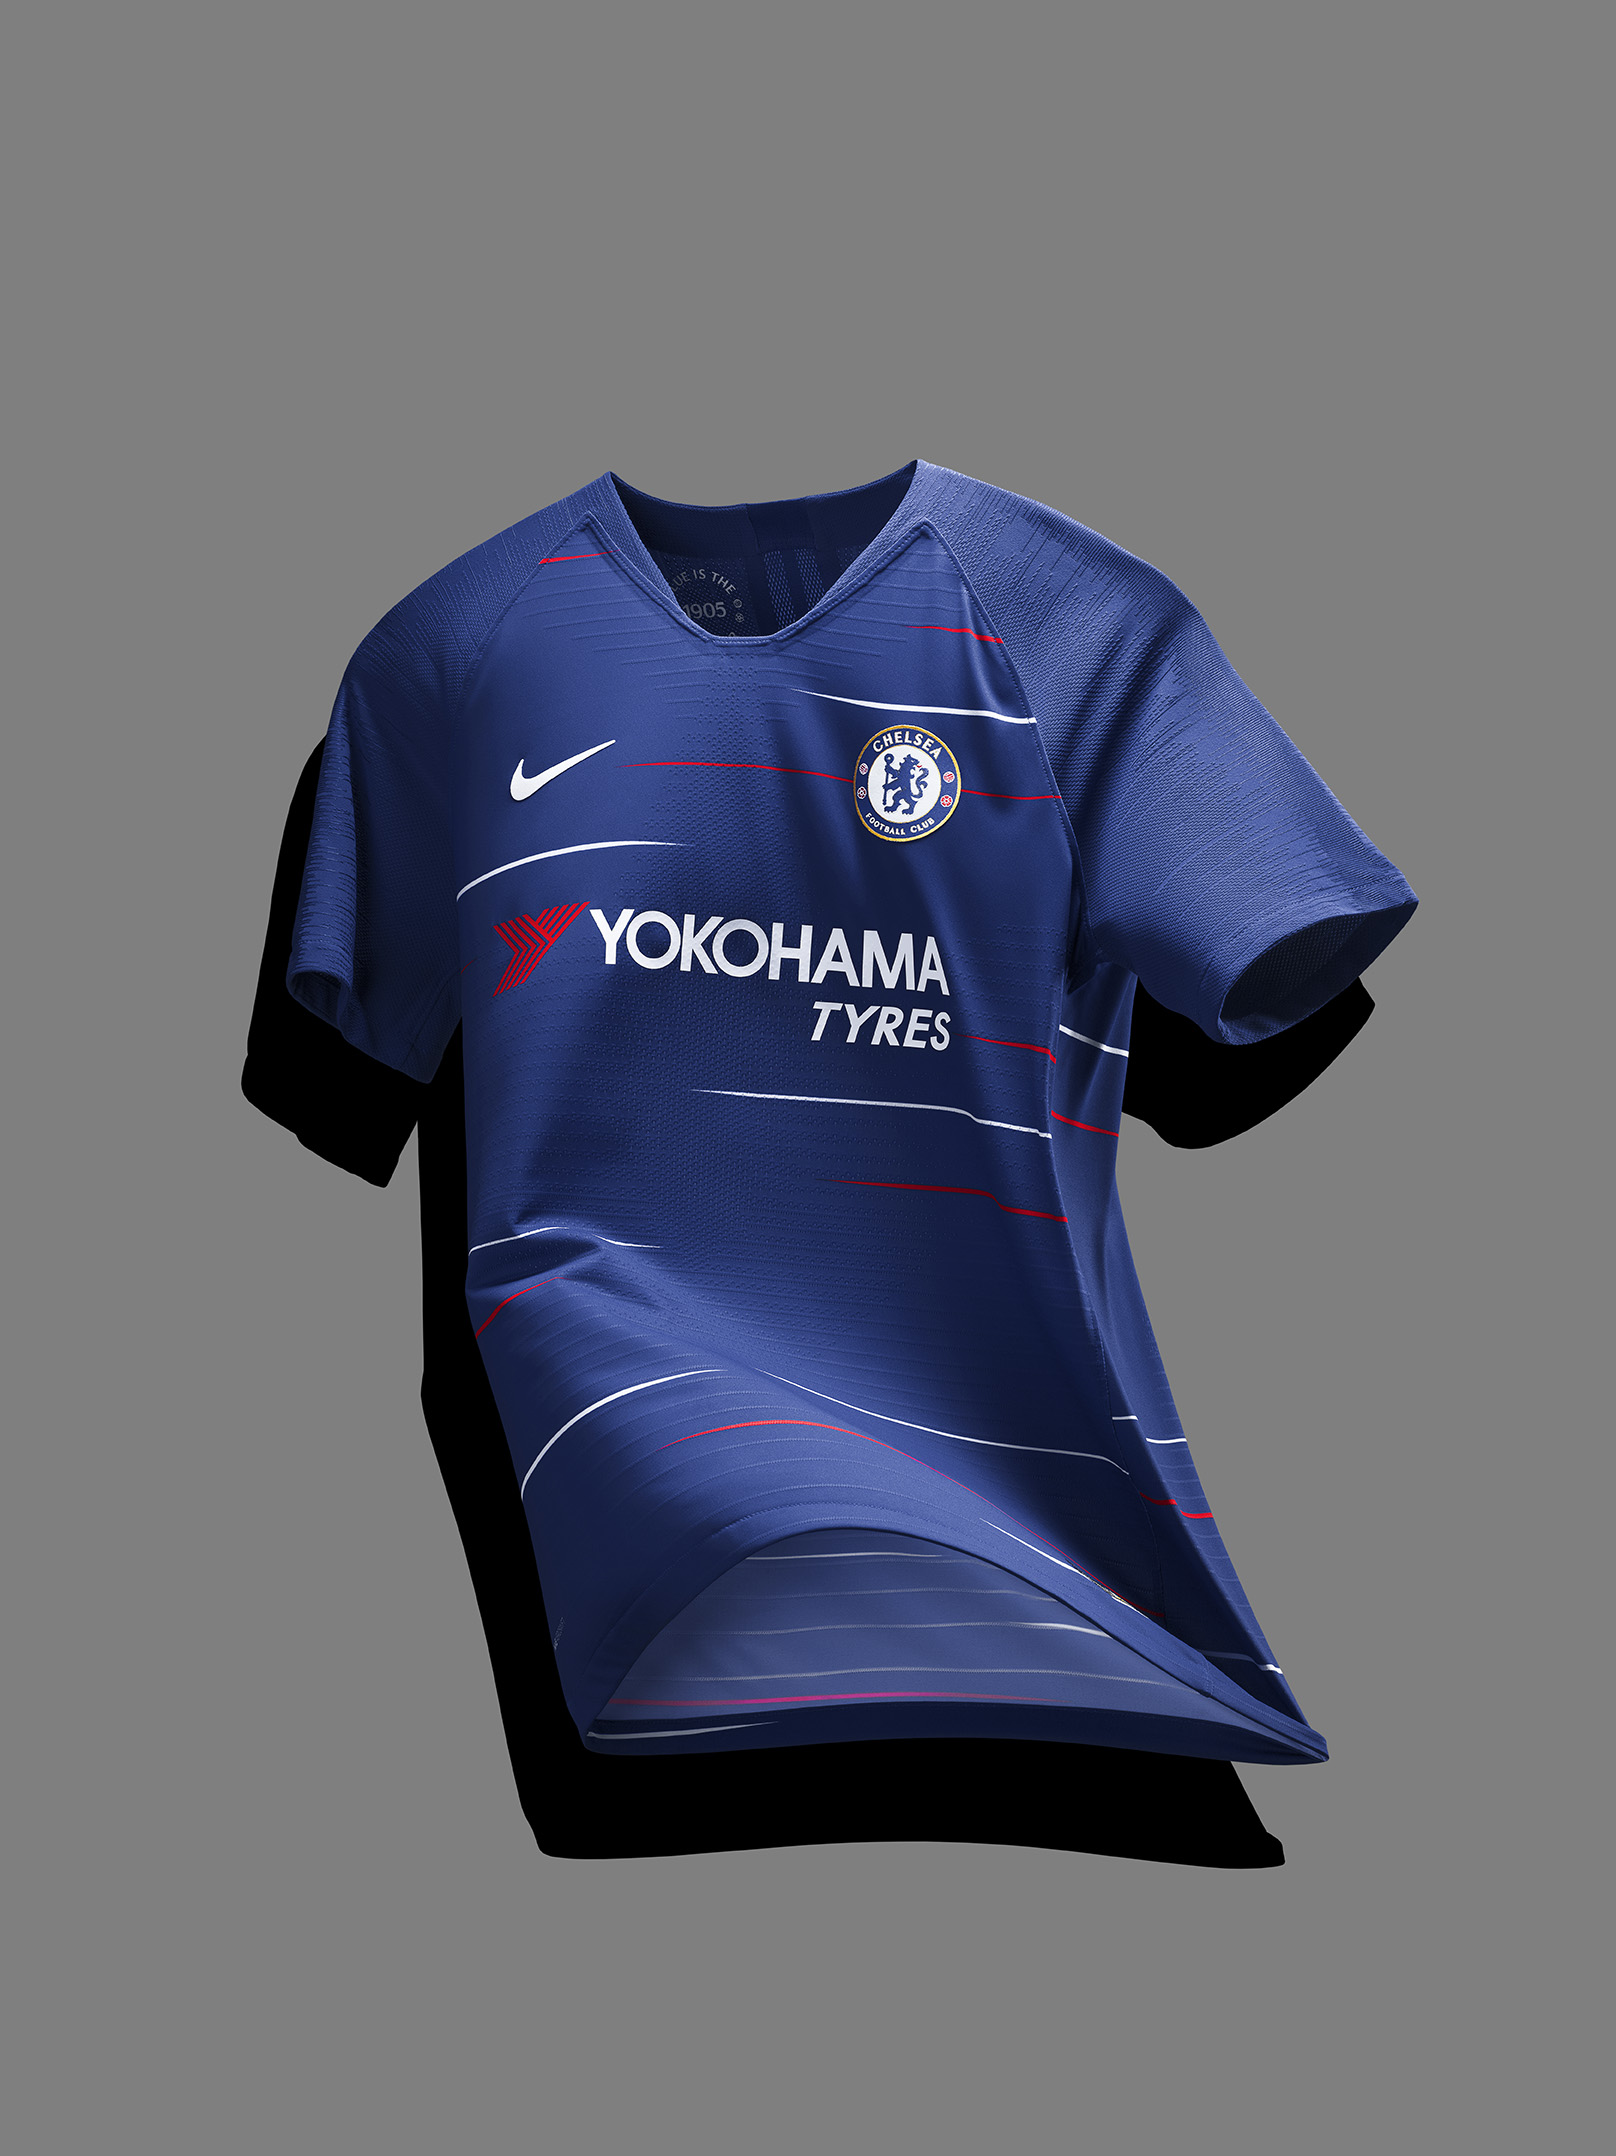 29f3d7789 Nike planning less garish Chelsea home shirt for next season — kit leak